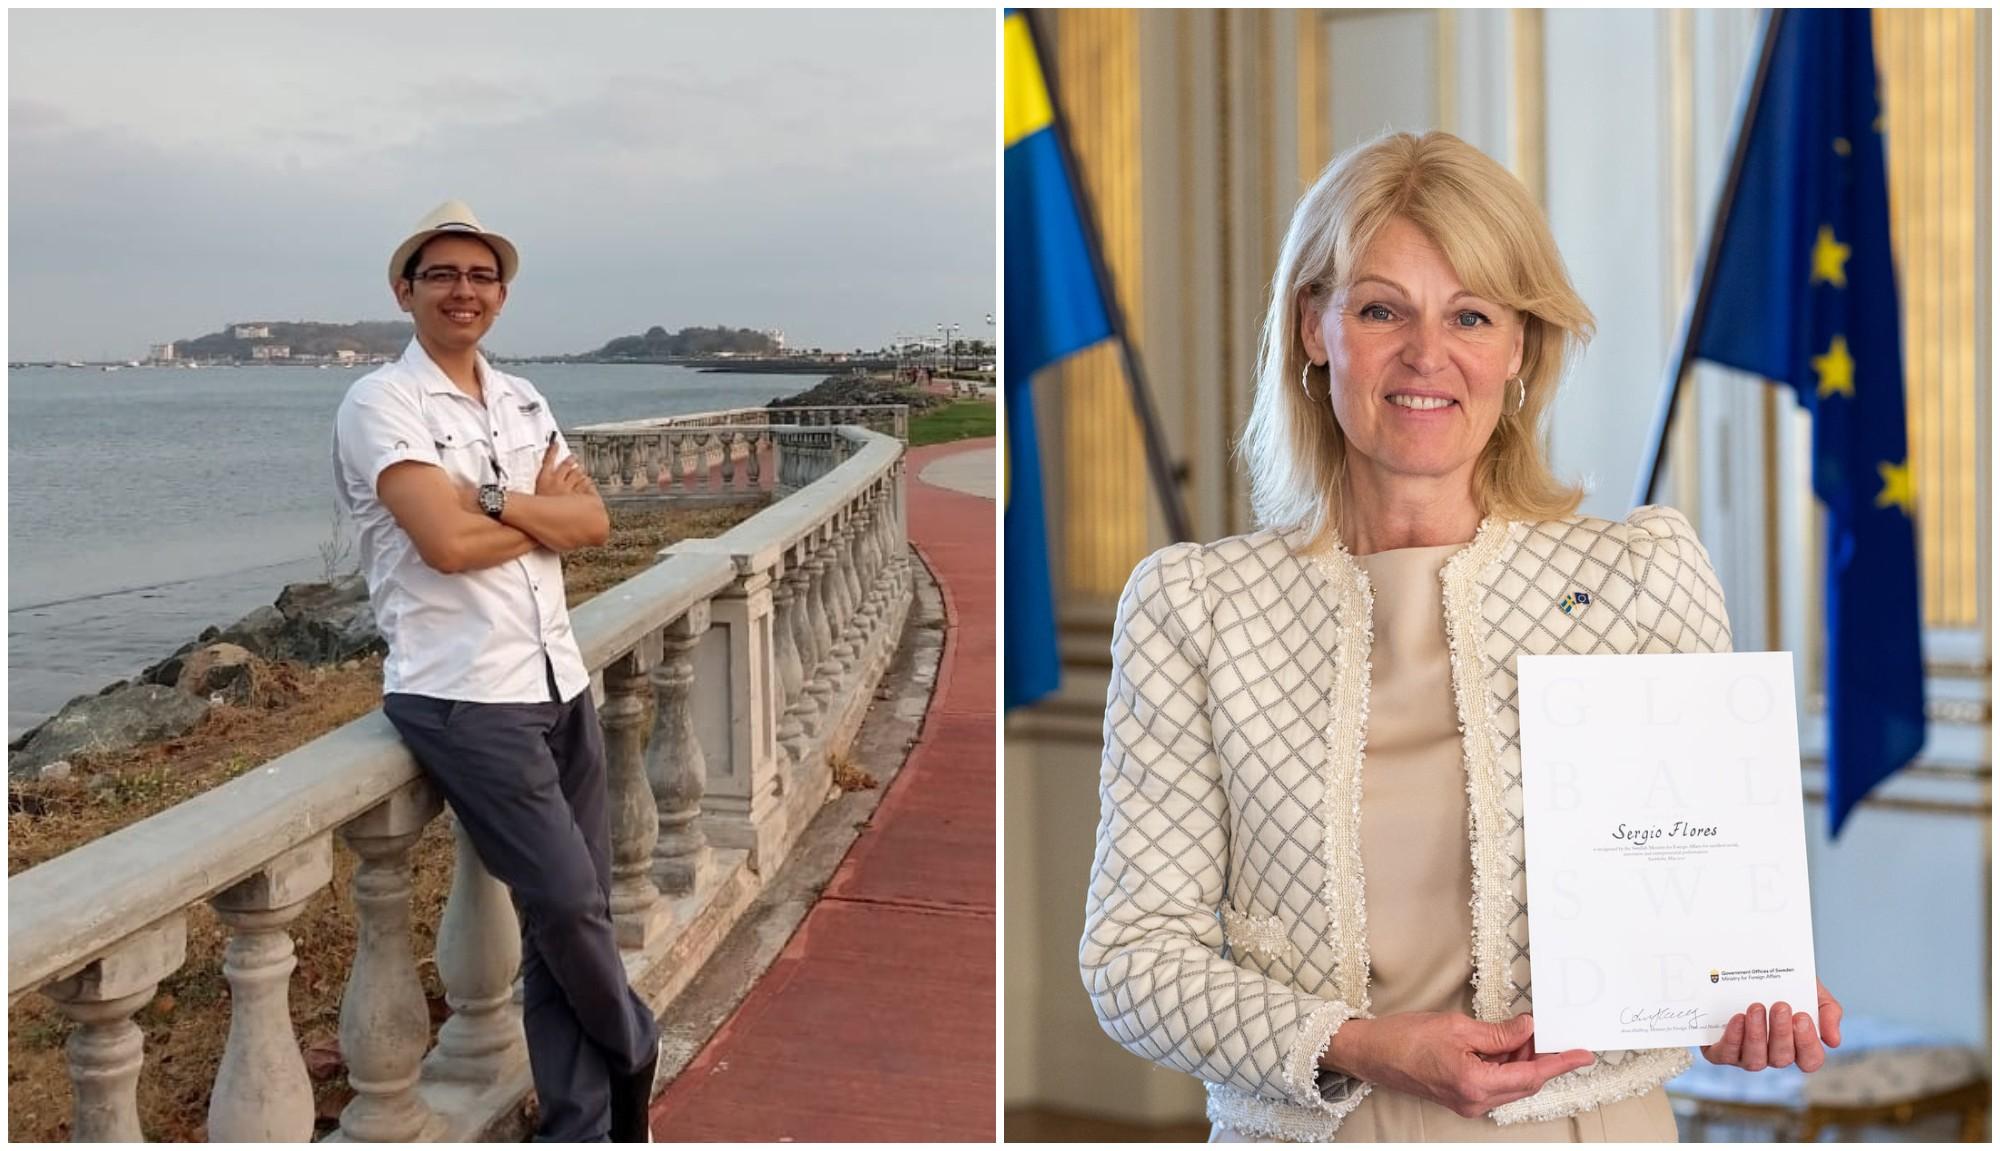 Hondureño recibe premio en Suecia por excelencia académica